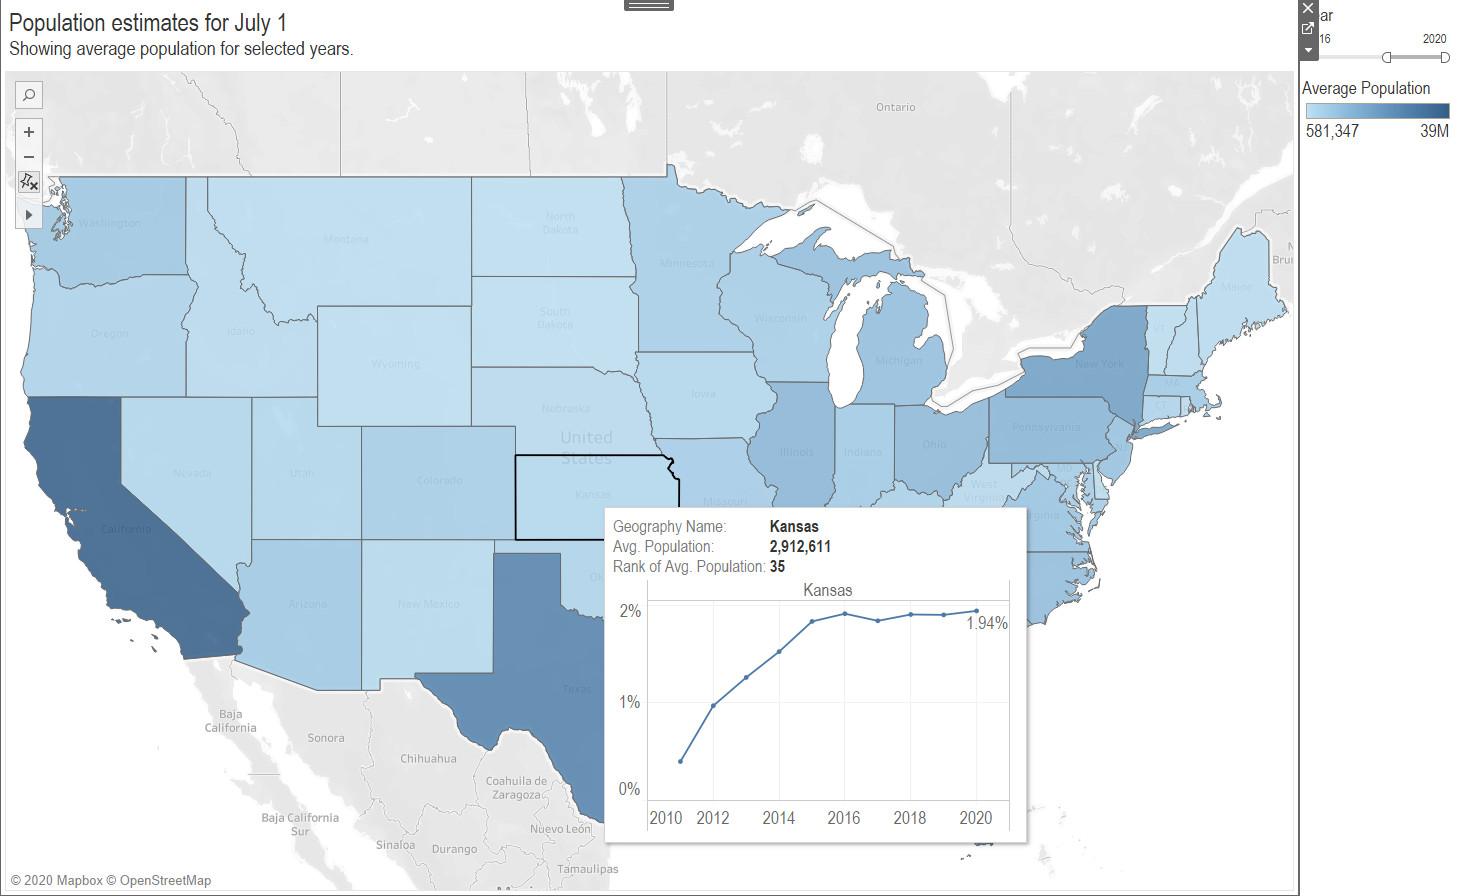 State population estimates for 2020